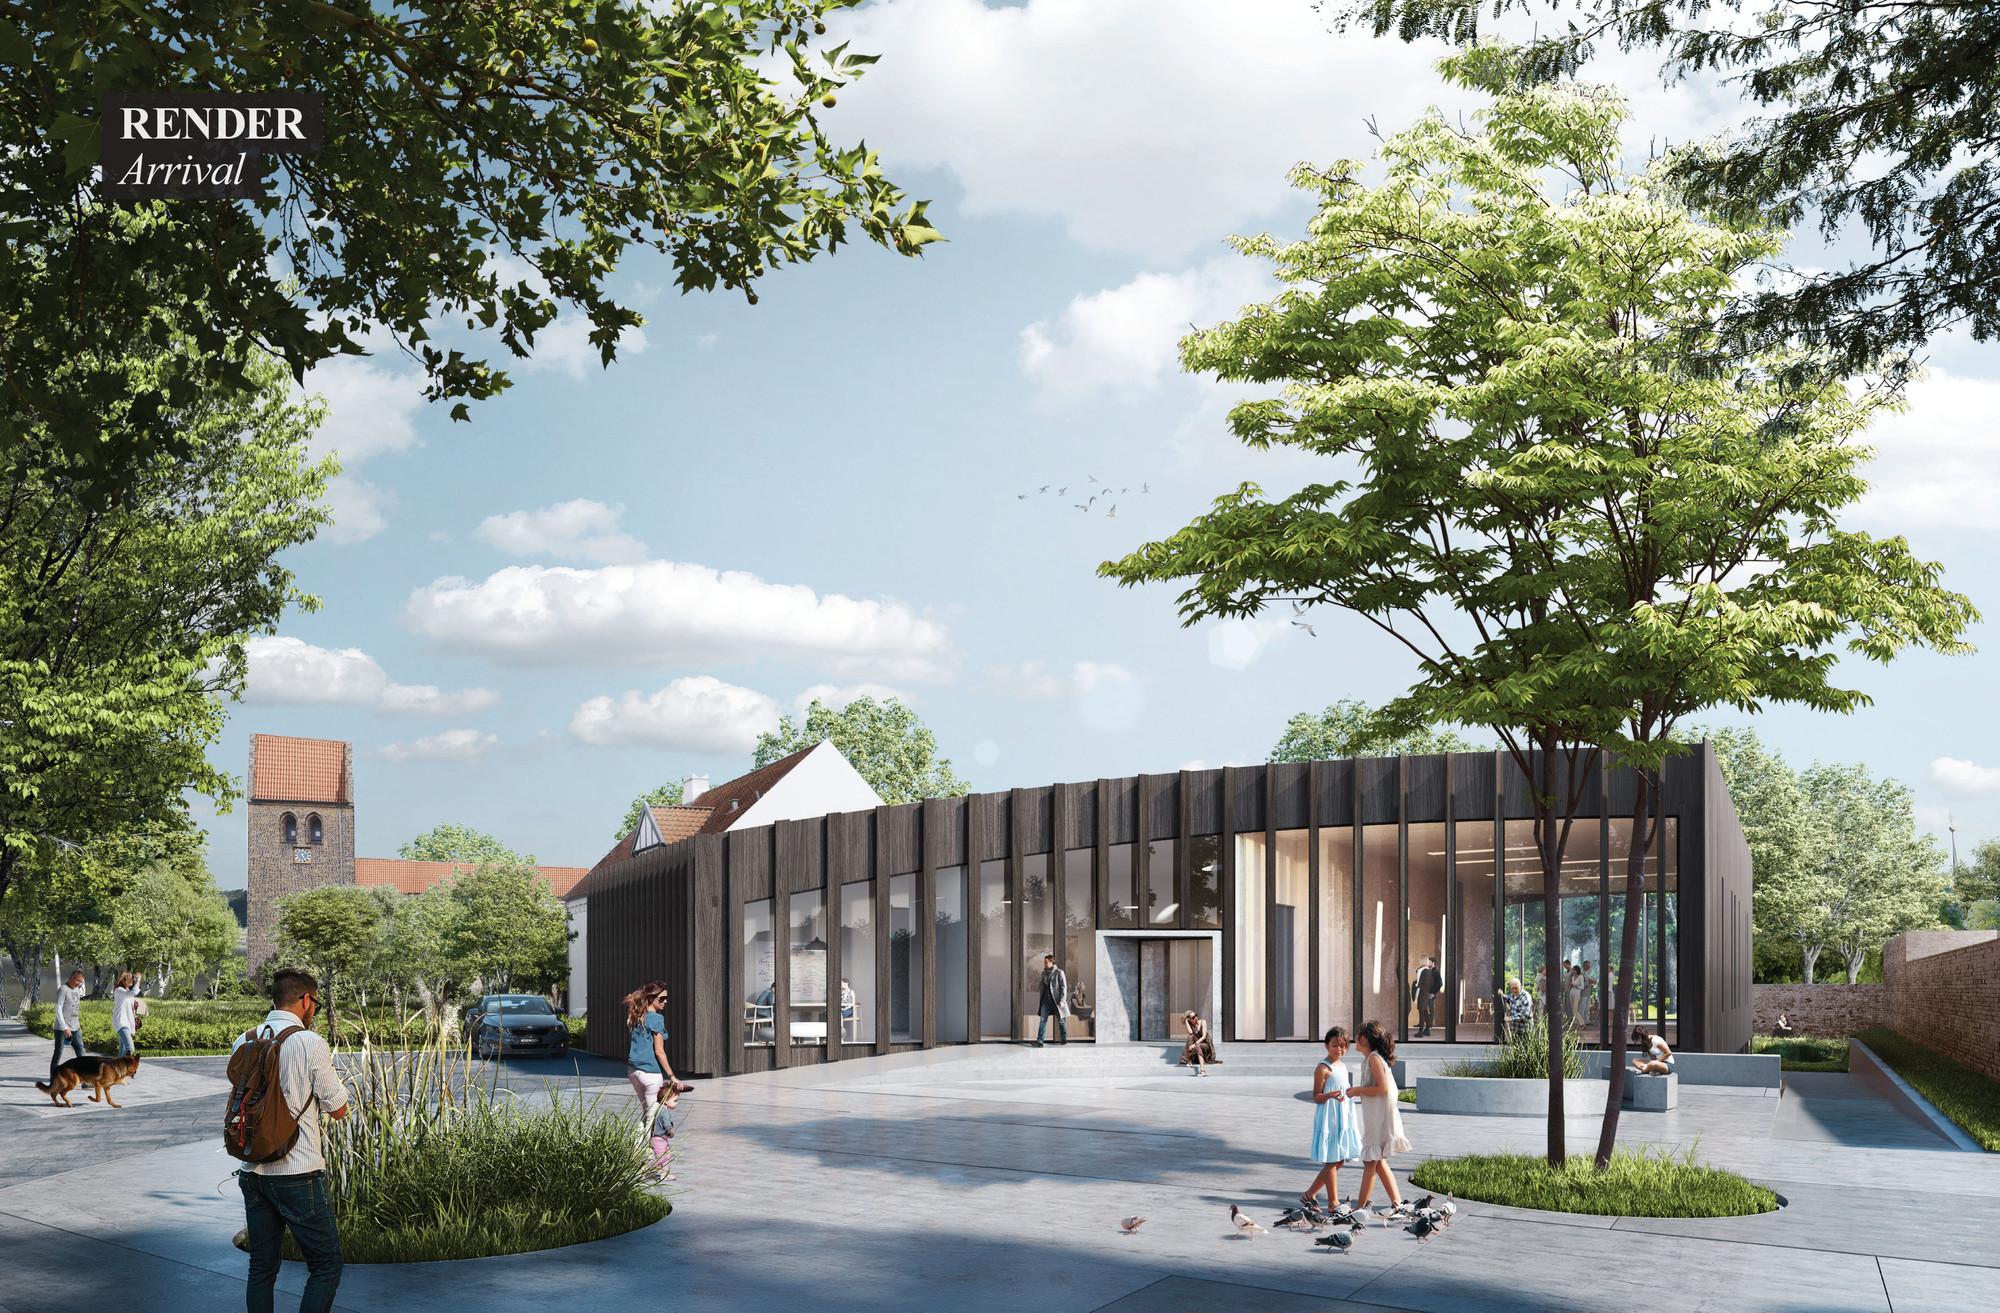 NORD Architects' Brønshøj Parish Centre Fosters Community Gathering, Courtesy of NORD Architects Copenhagen